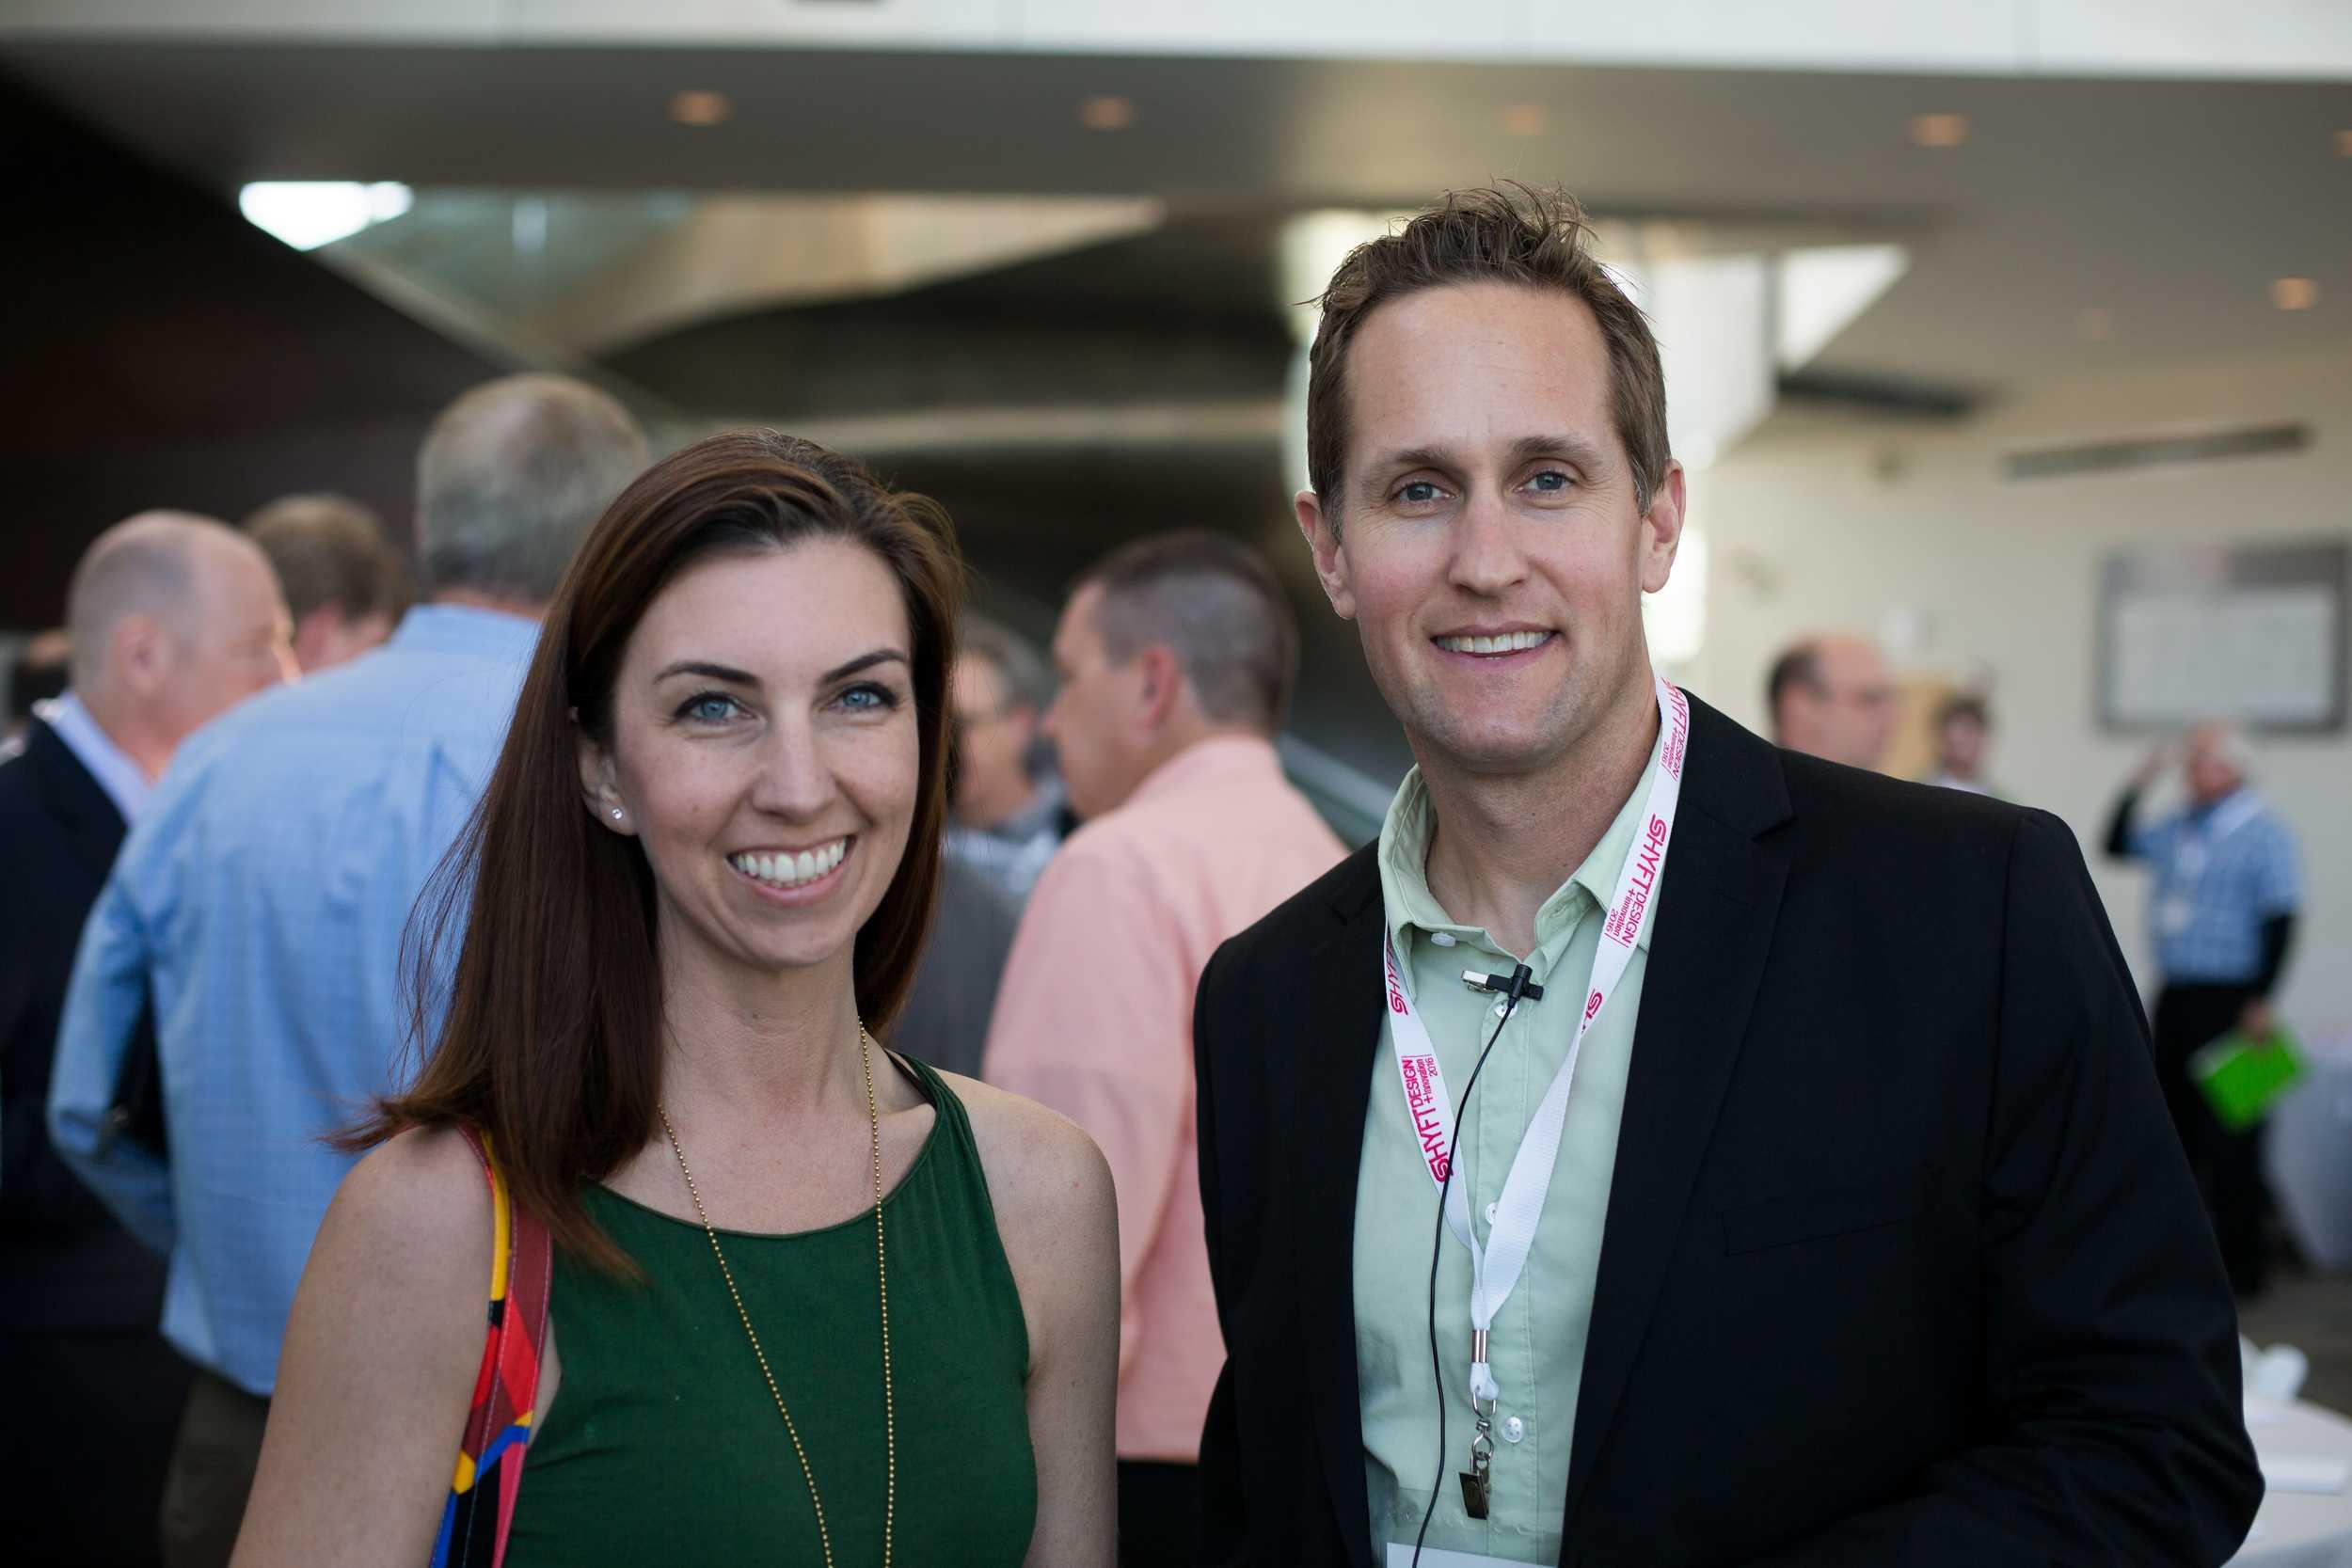 Darren Reinke, Managing Director, Group Sixty & Marketing Lead, Techmer PM